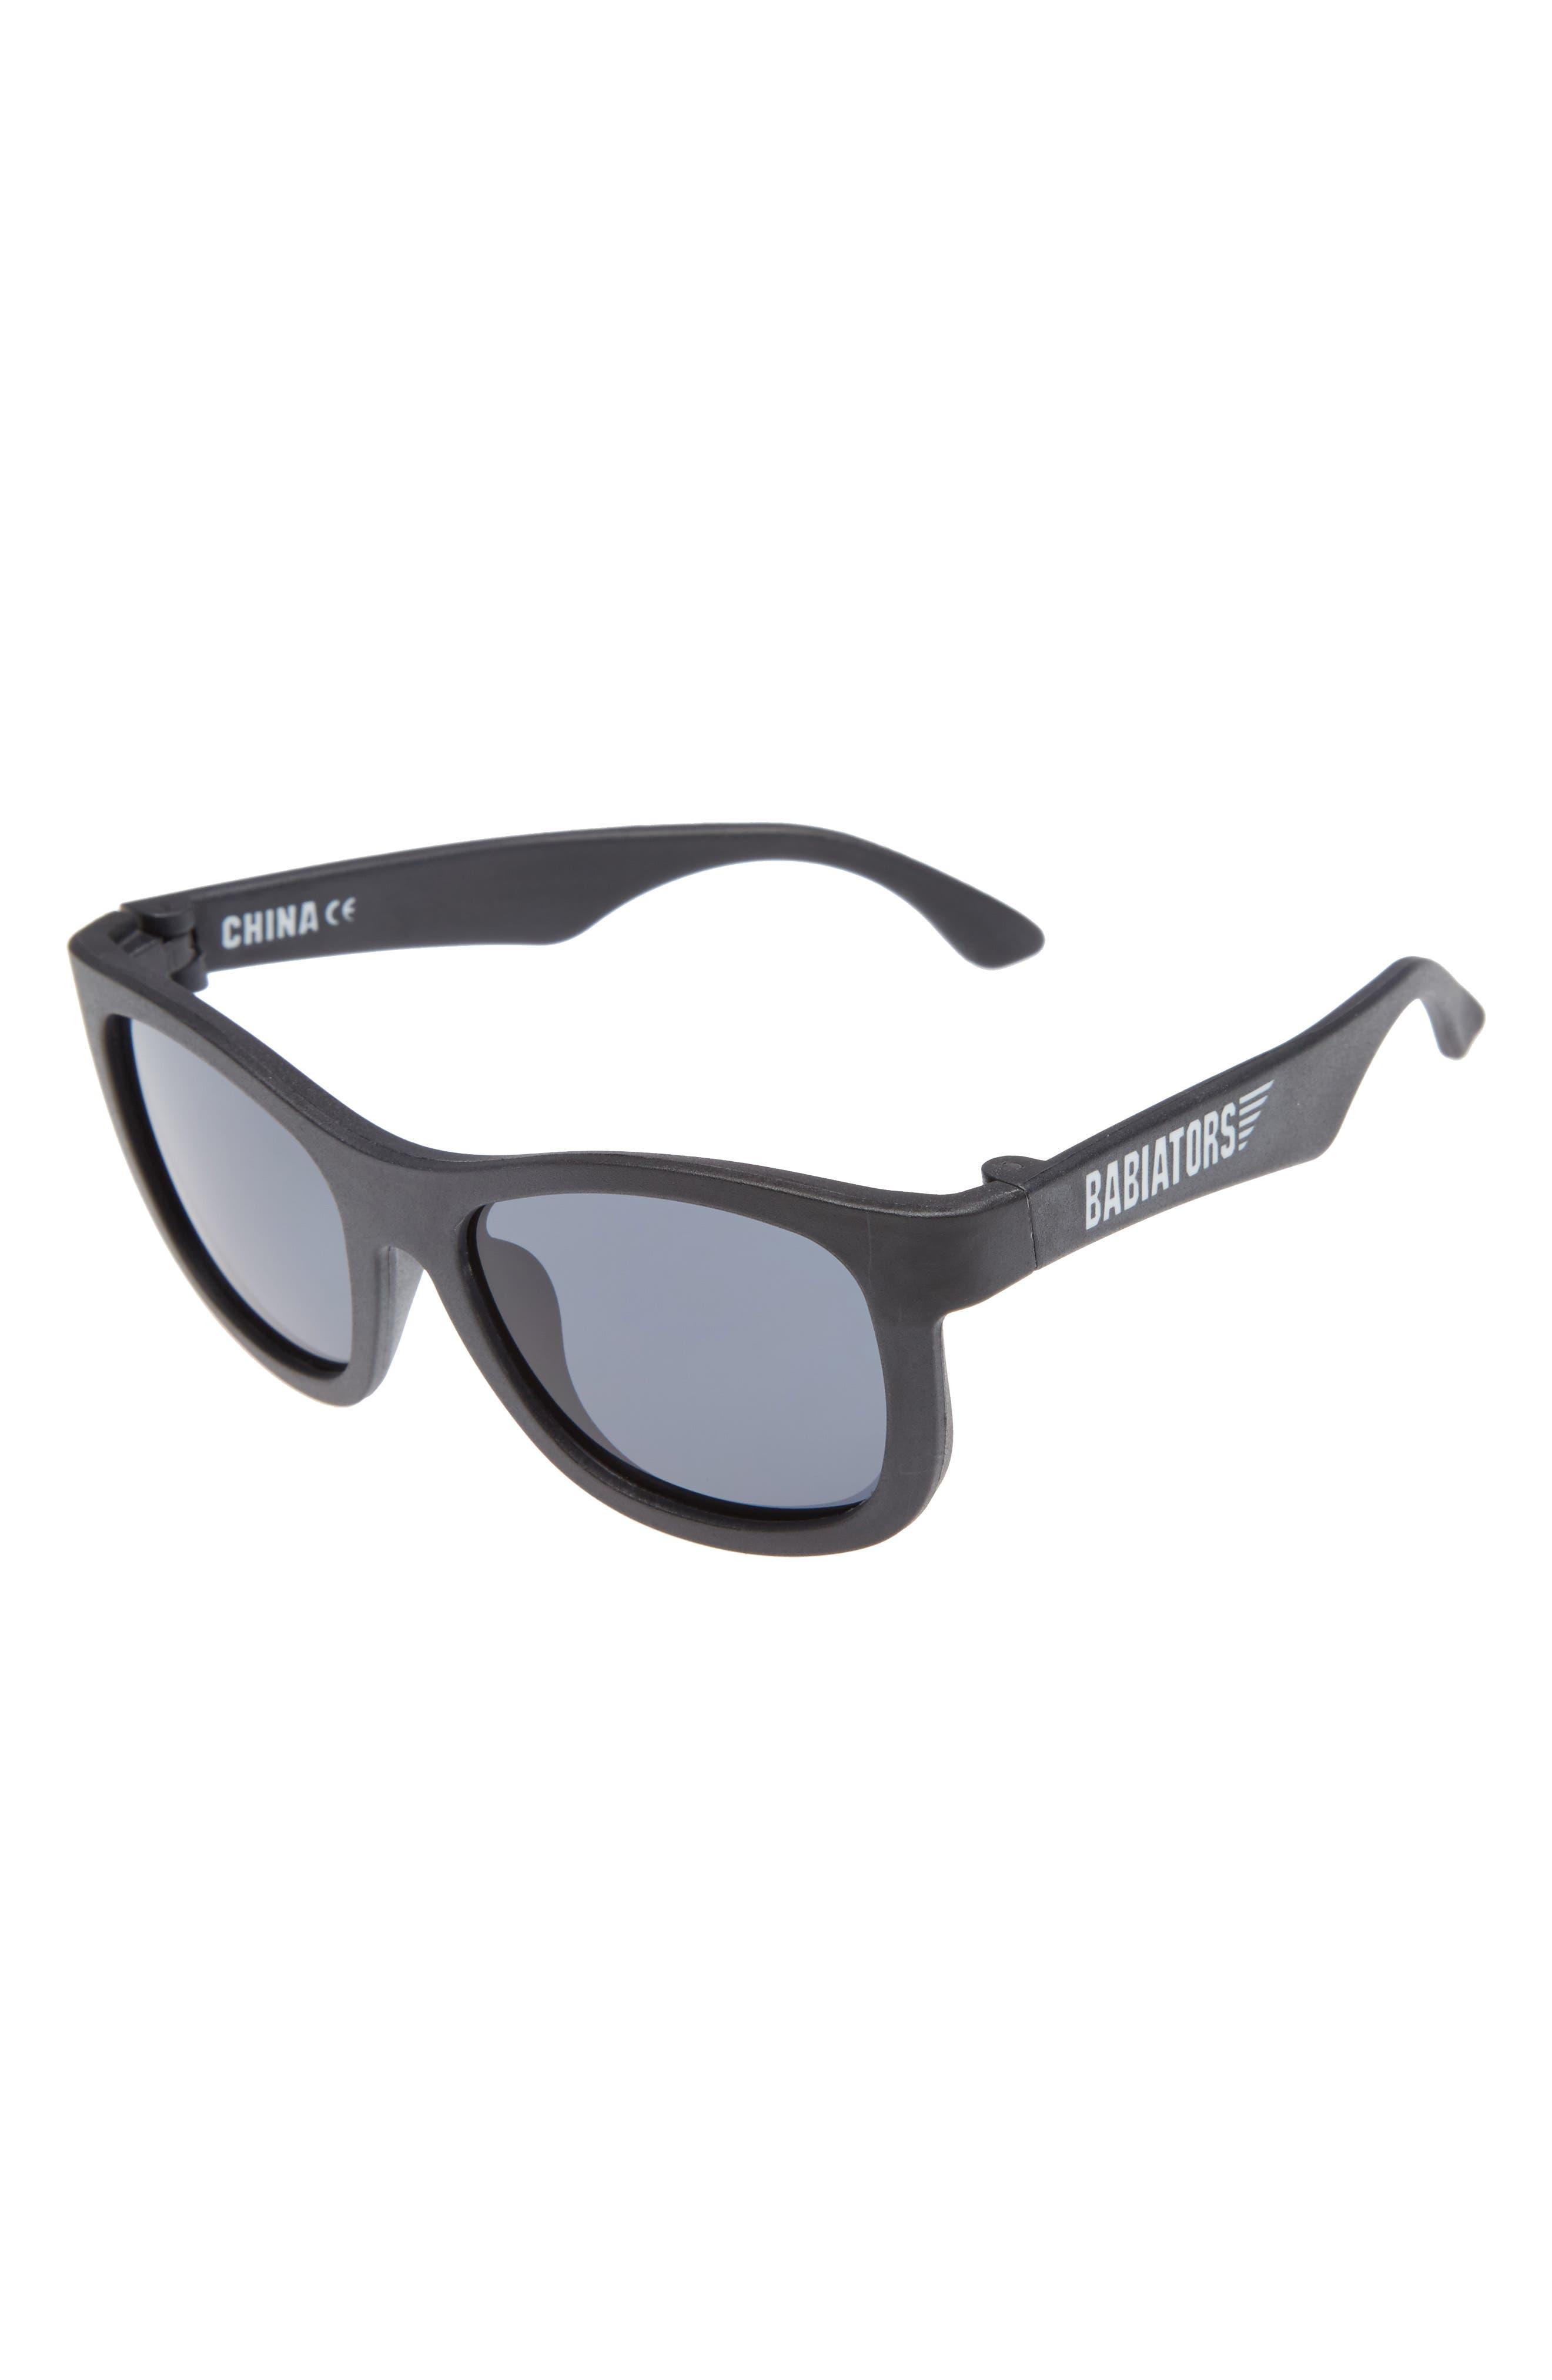 535b0ac515 kids sunglasses